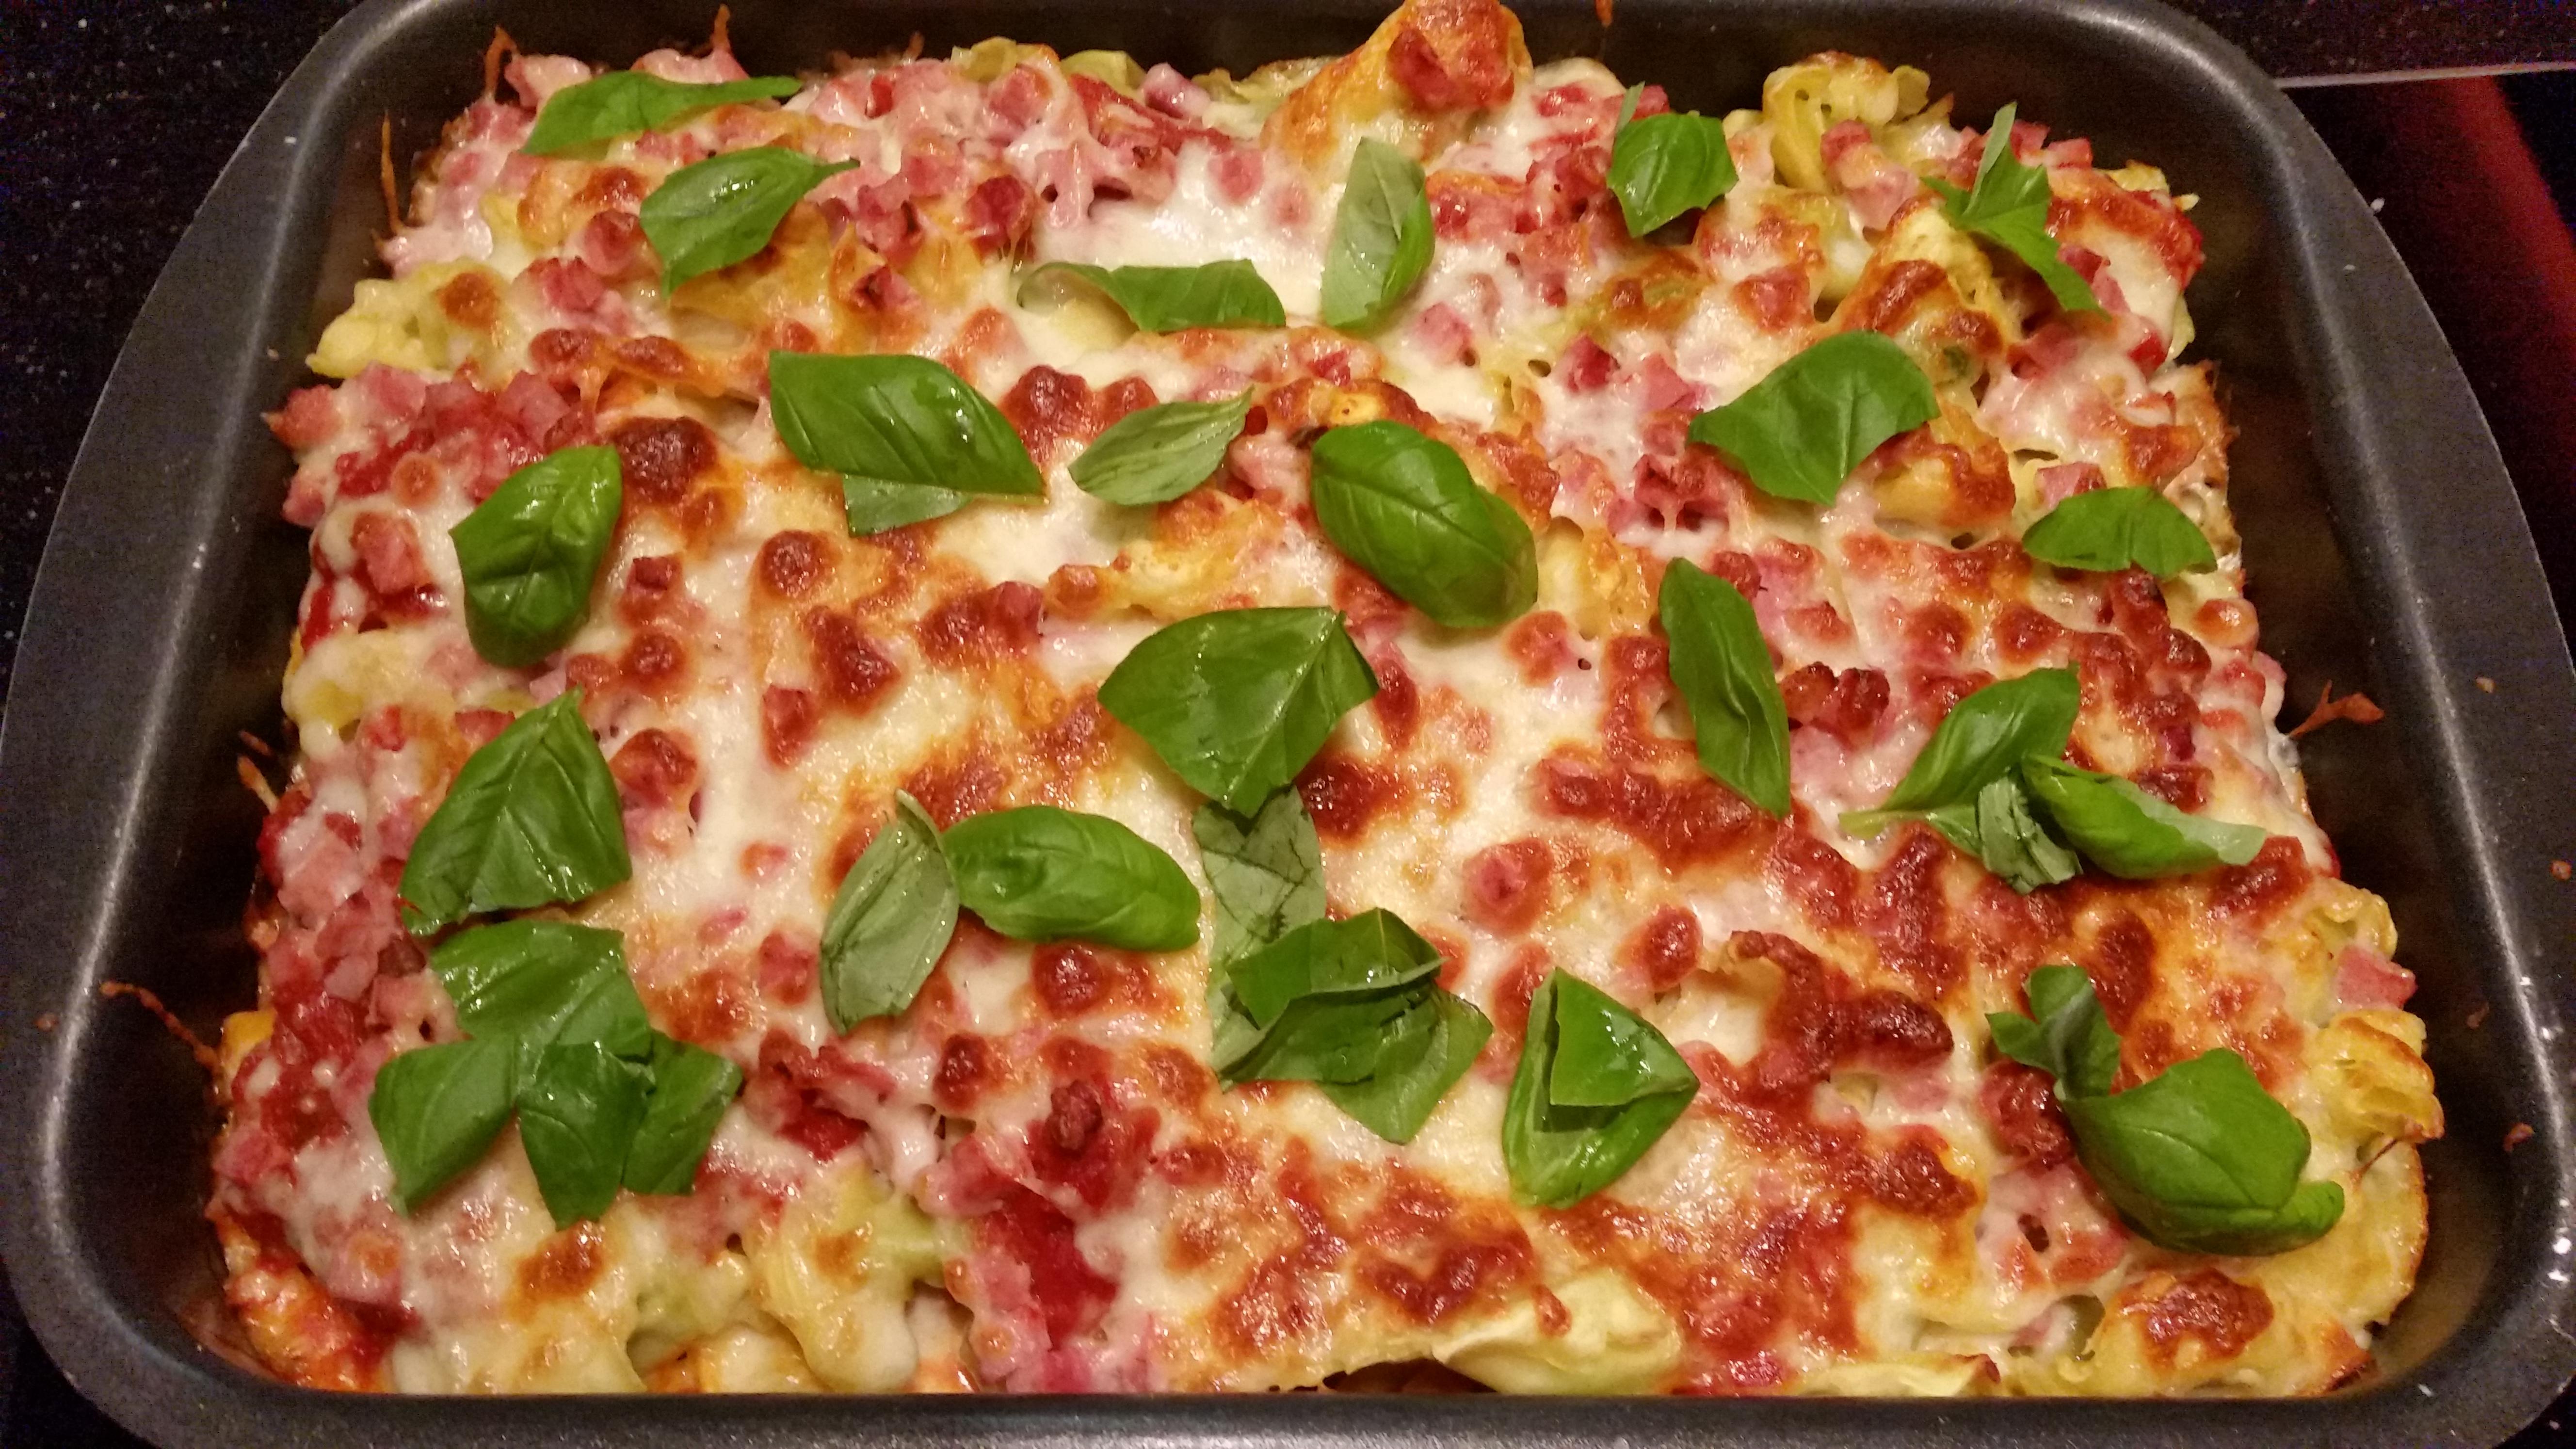 Tortellini met tomatensaus, hamblokjes en mozzarella